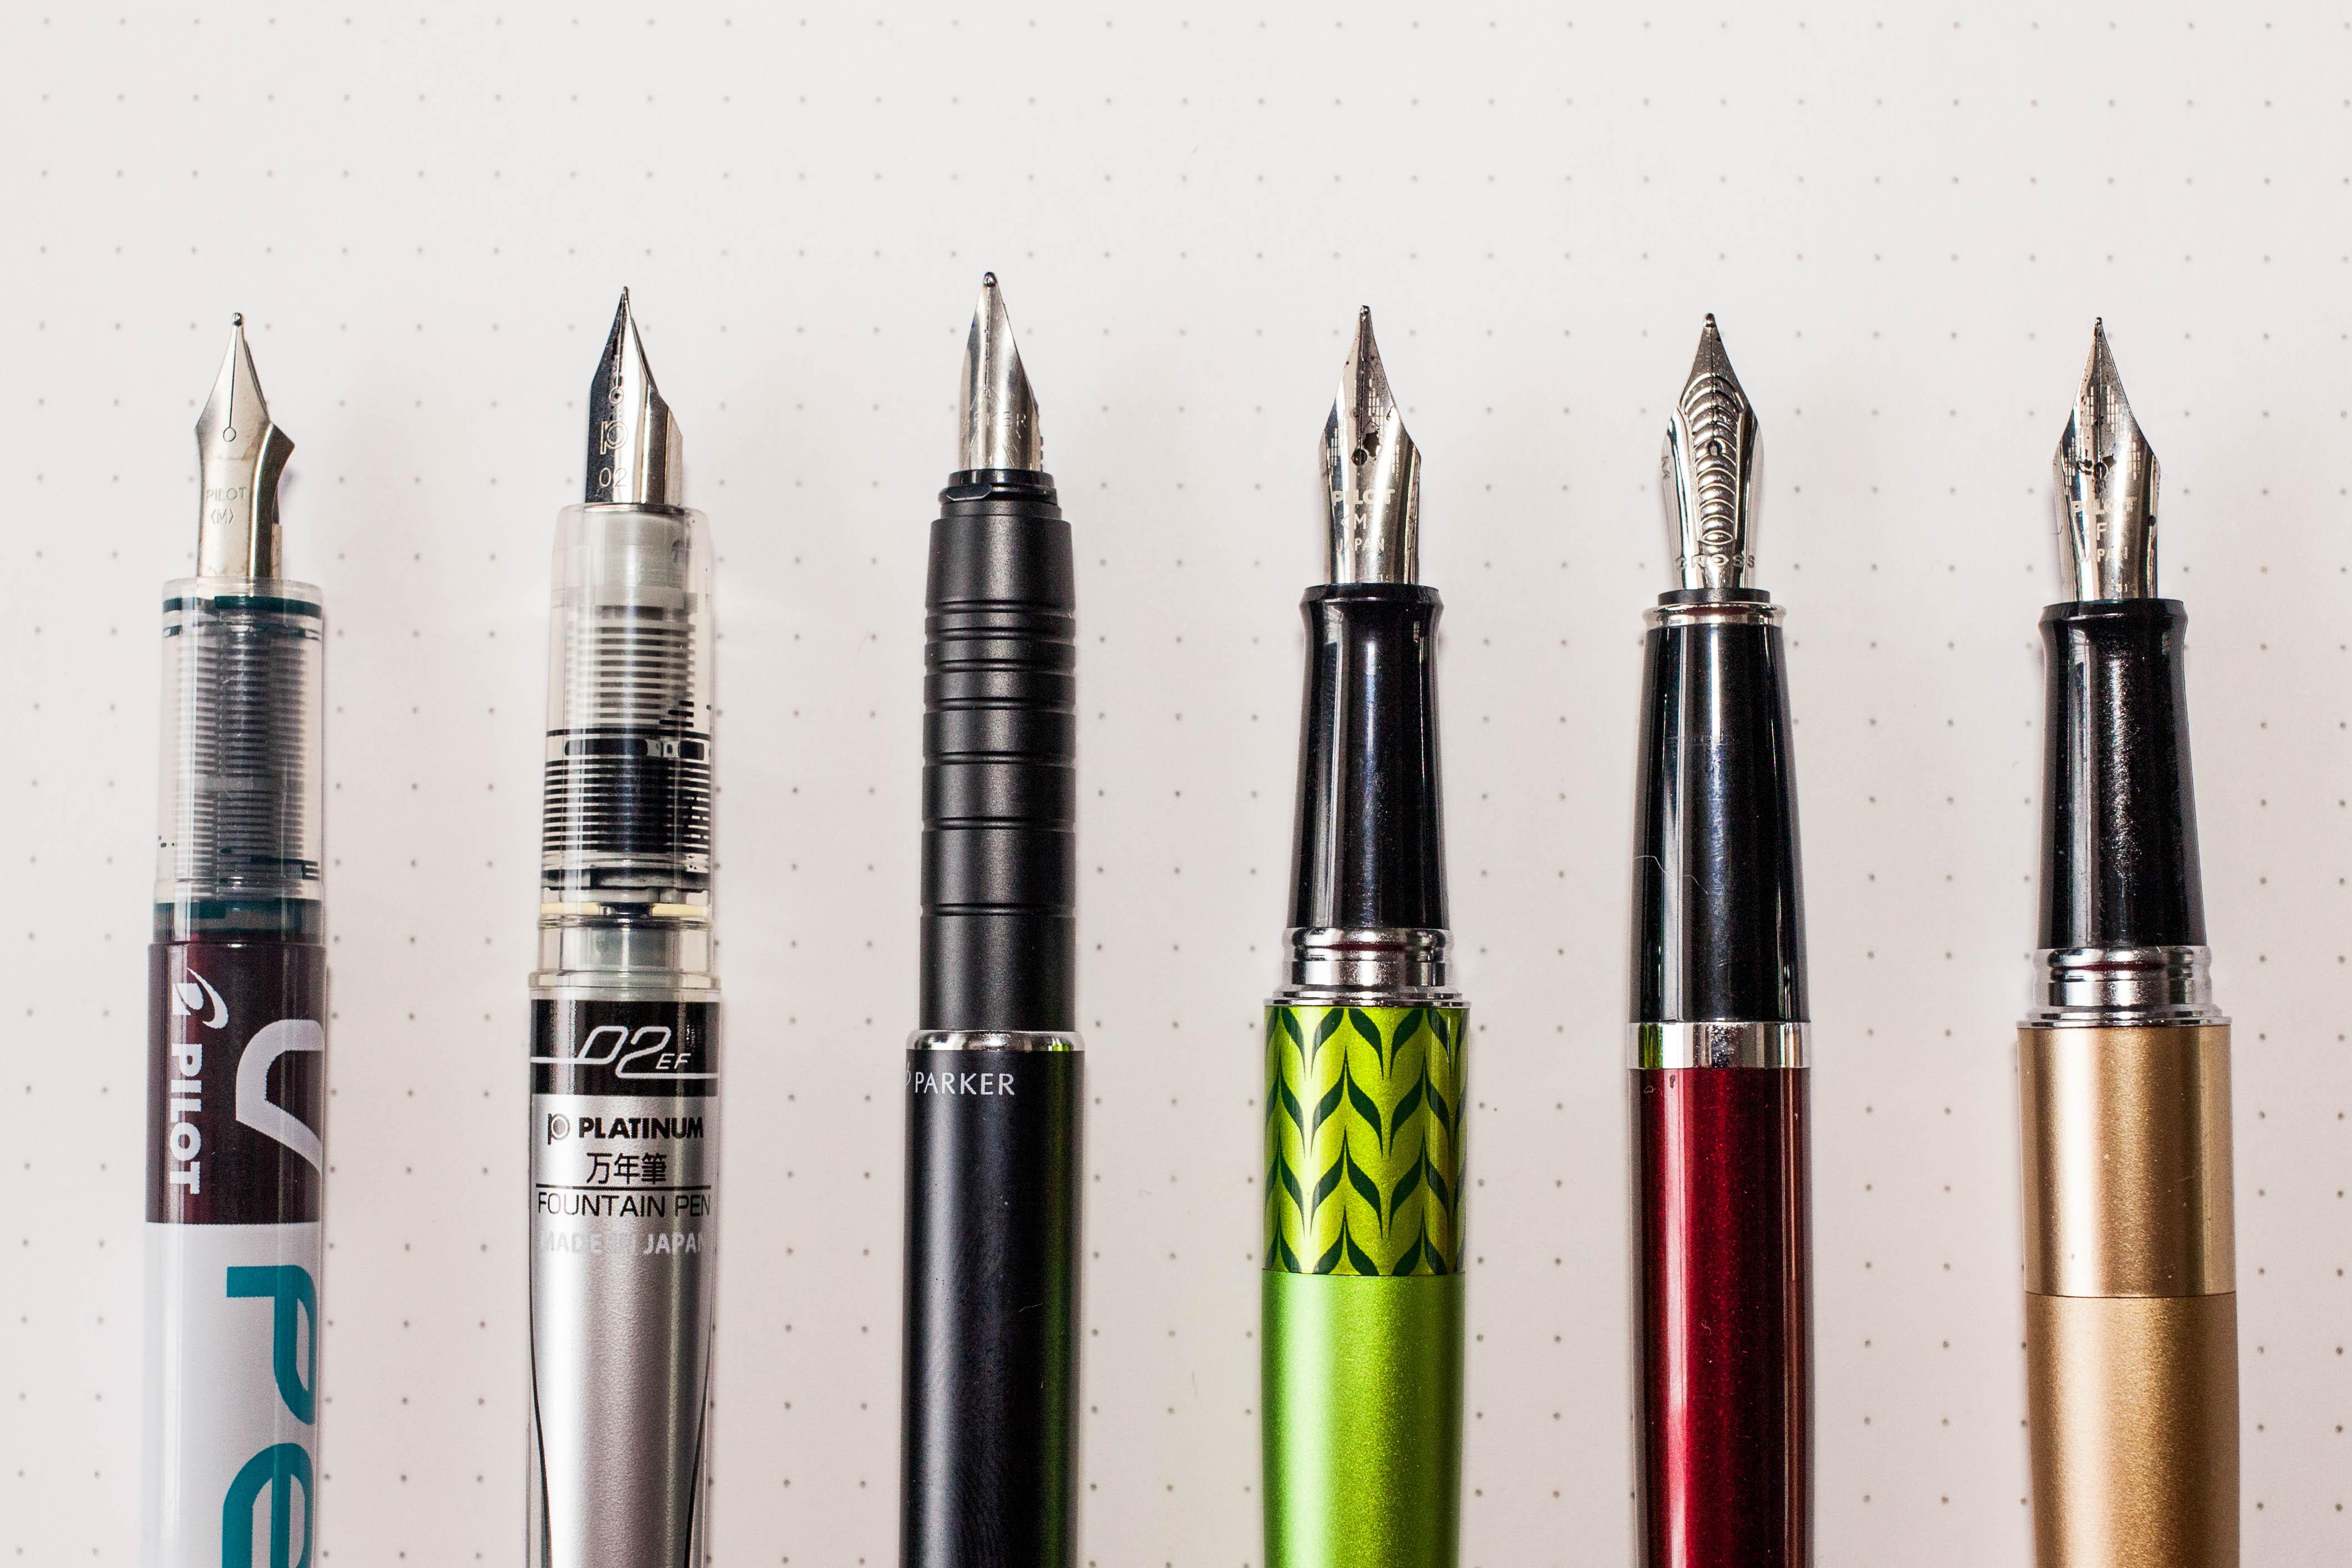 Fountain pens Galore